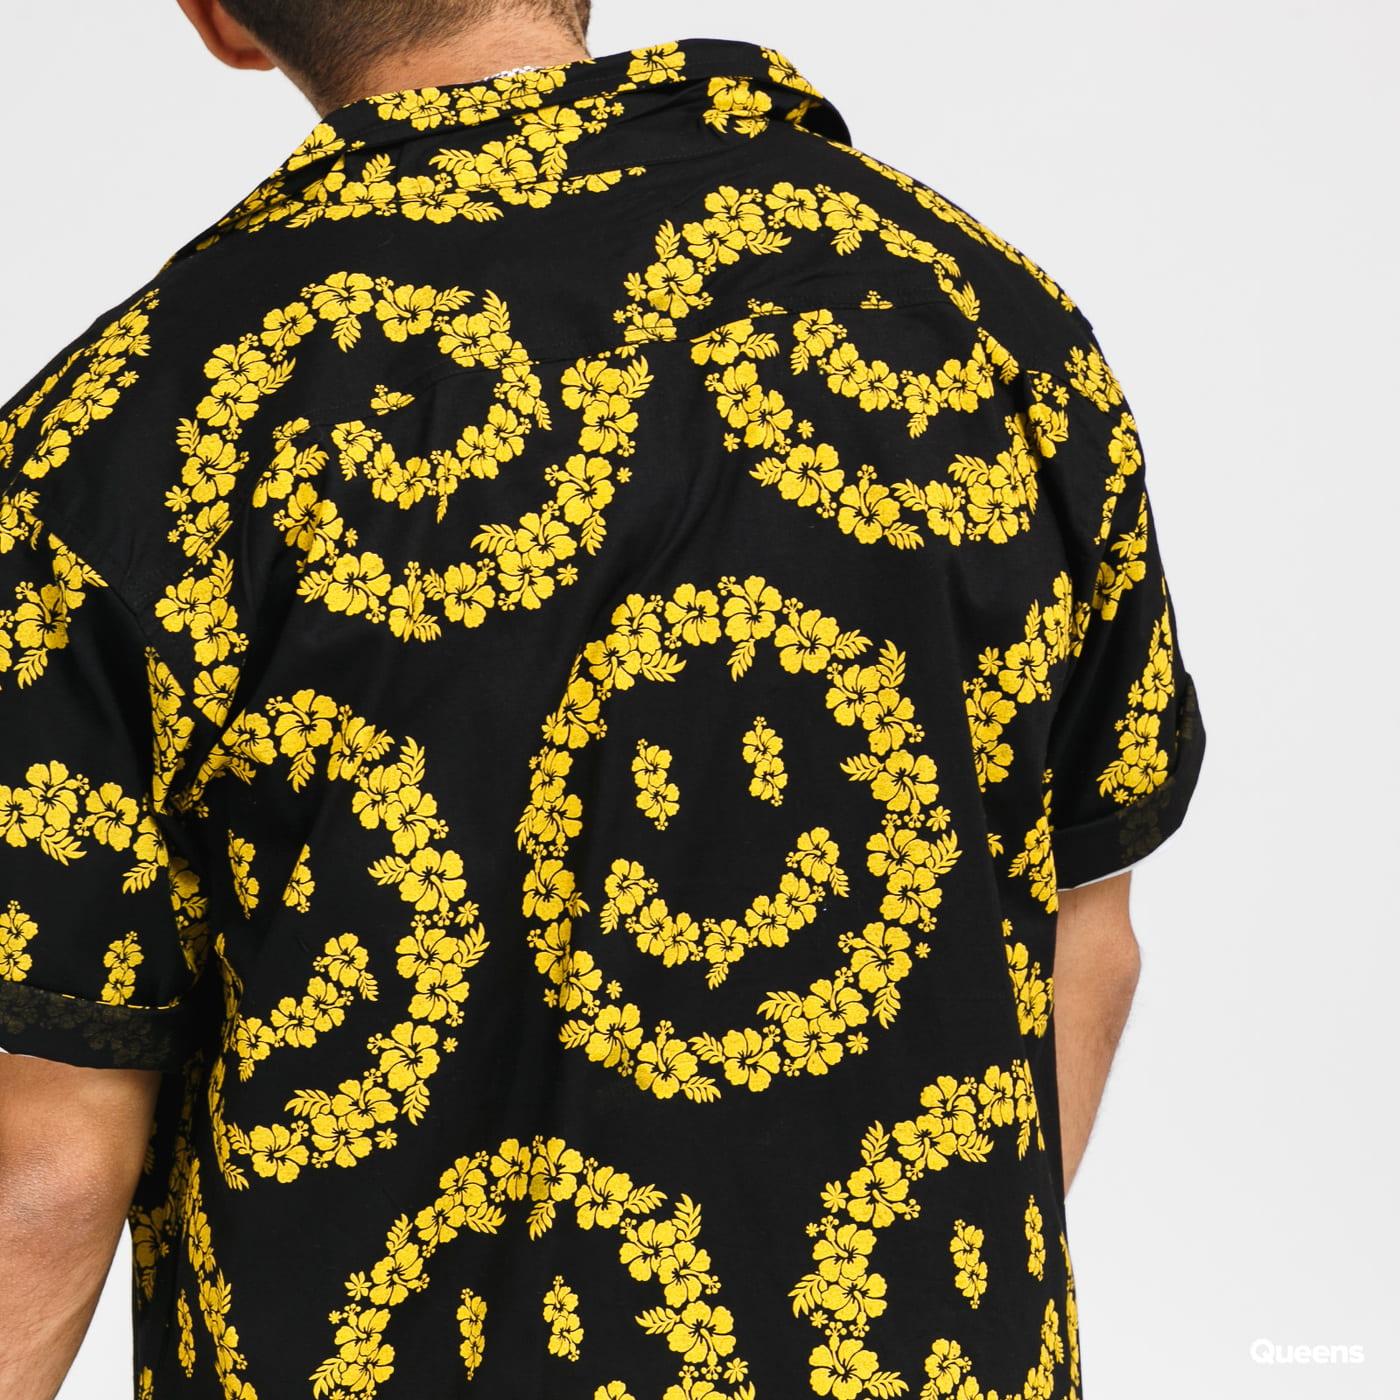 Chinatown Market Smiley Floral Shirt černá / žlutá